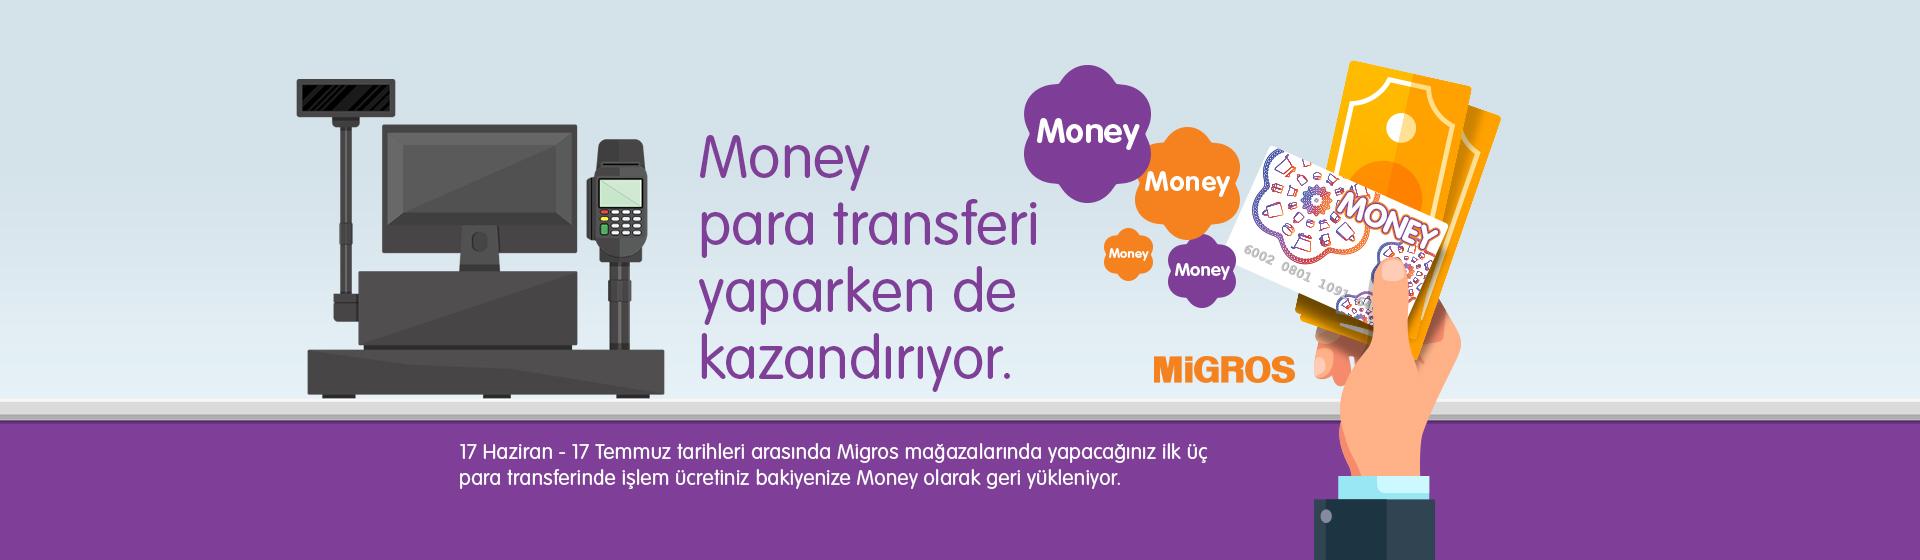 Money Para Transferi Kampanyası